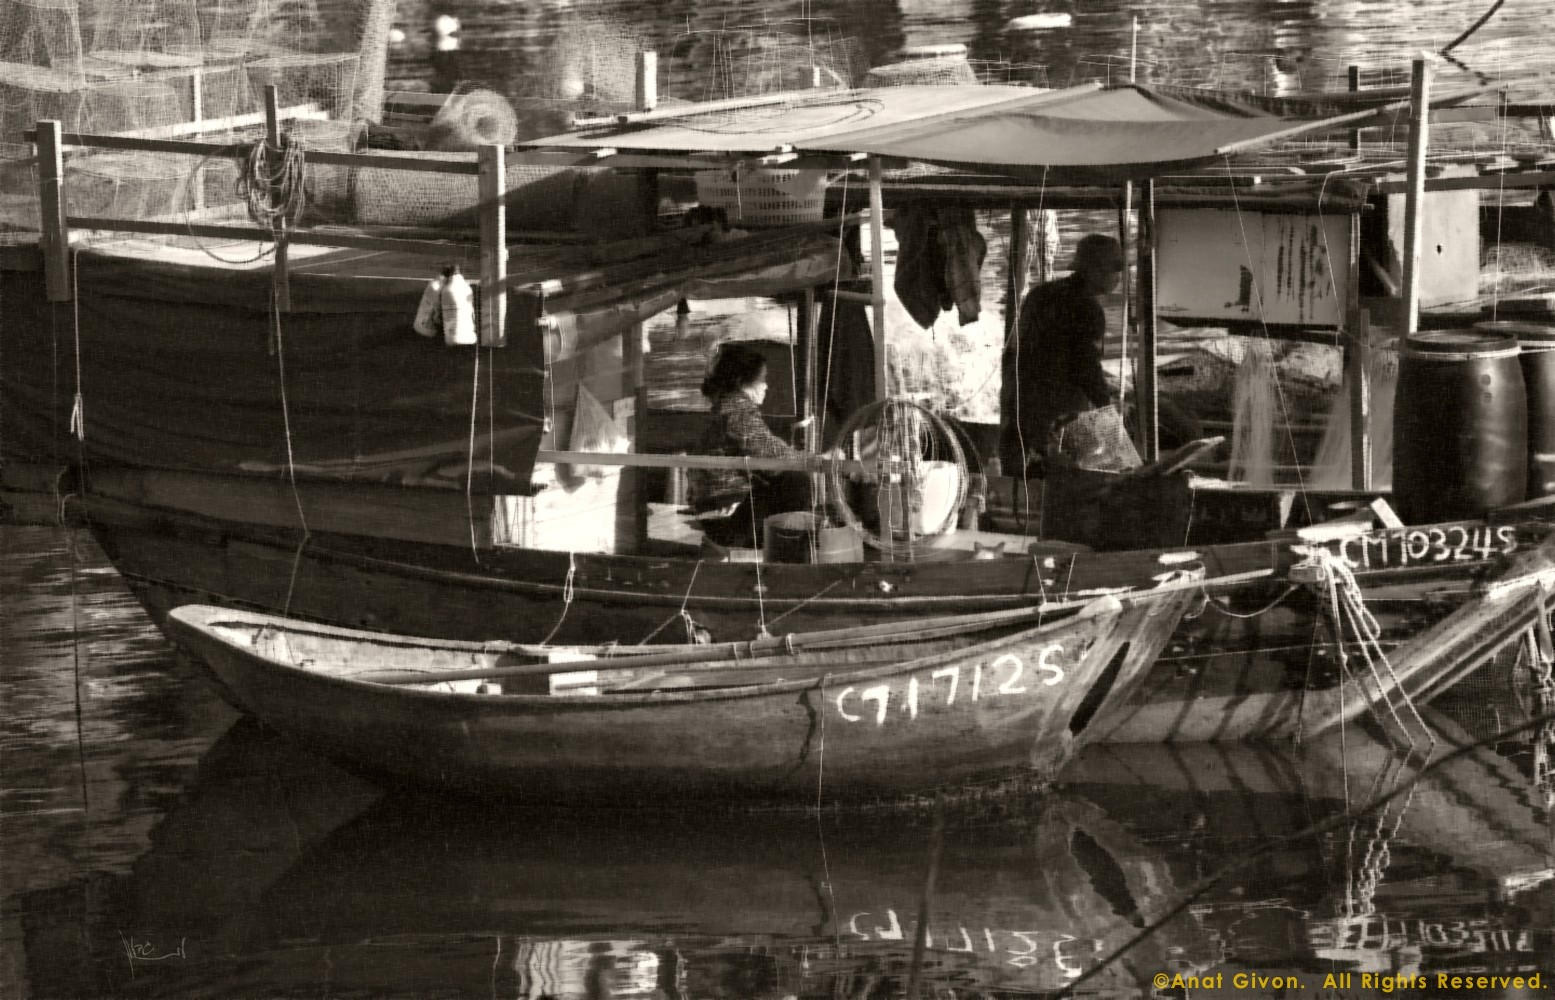 Lei Yu Mun Couple On Fishing Boat, HK